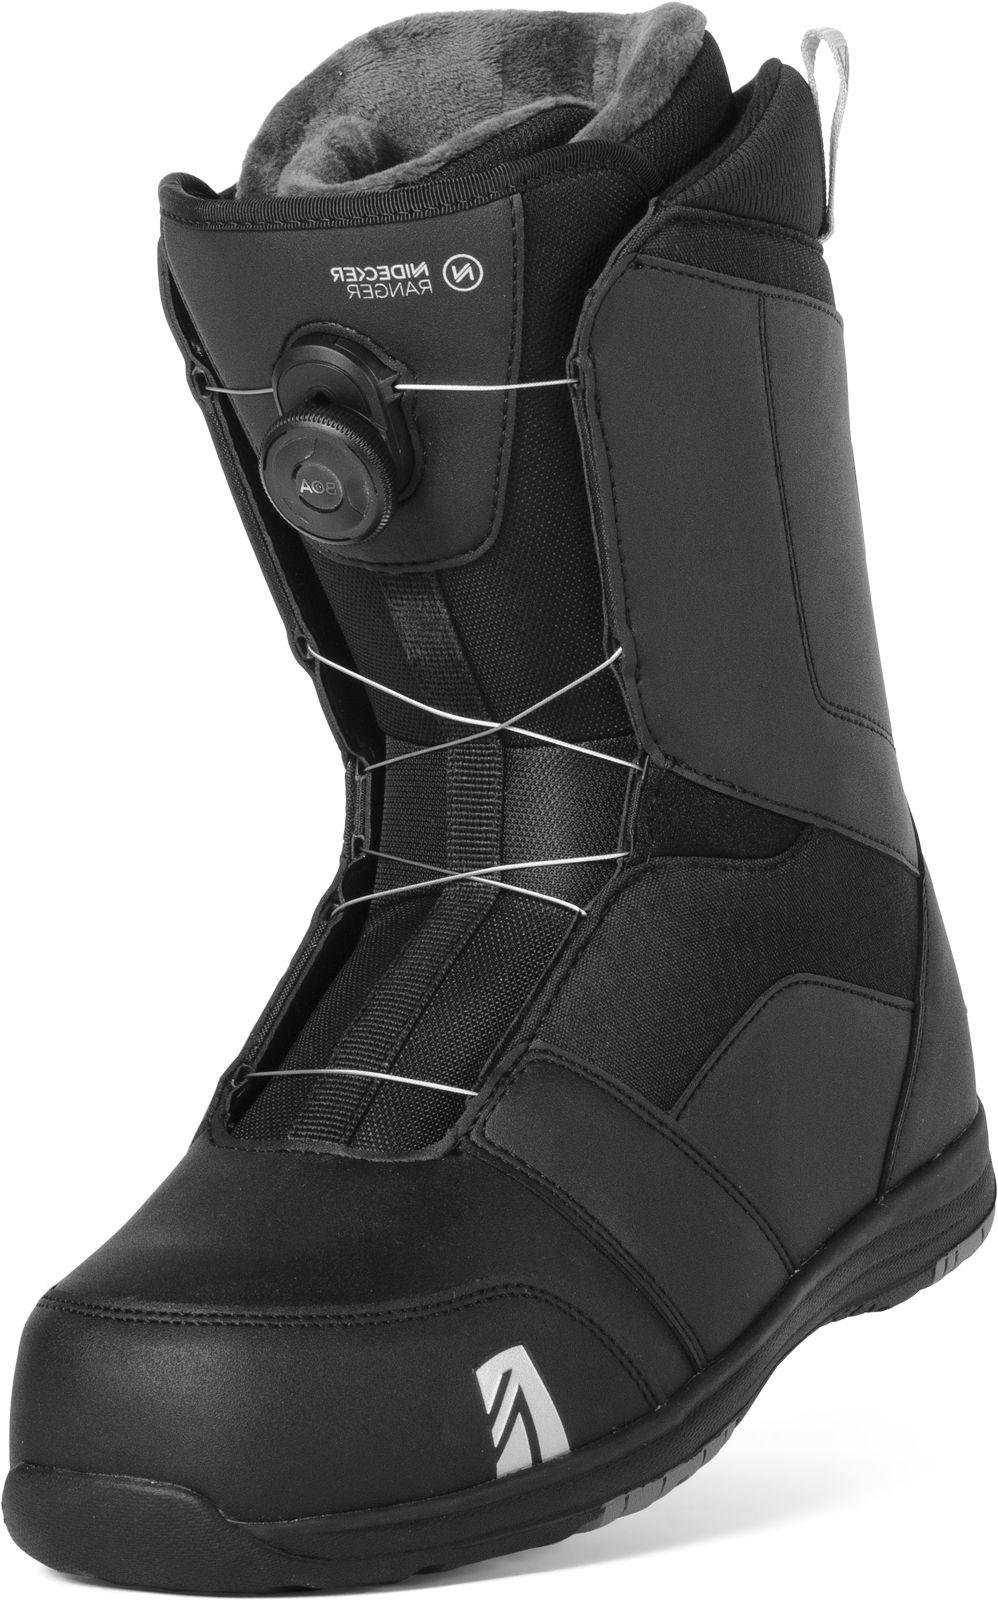 Ботинки для сноуборда Nidecker